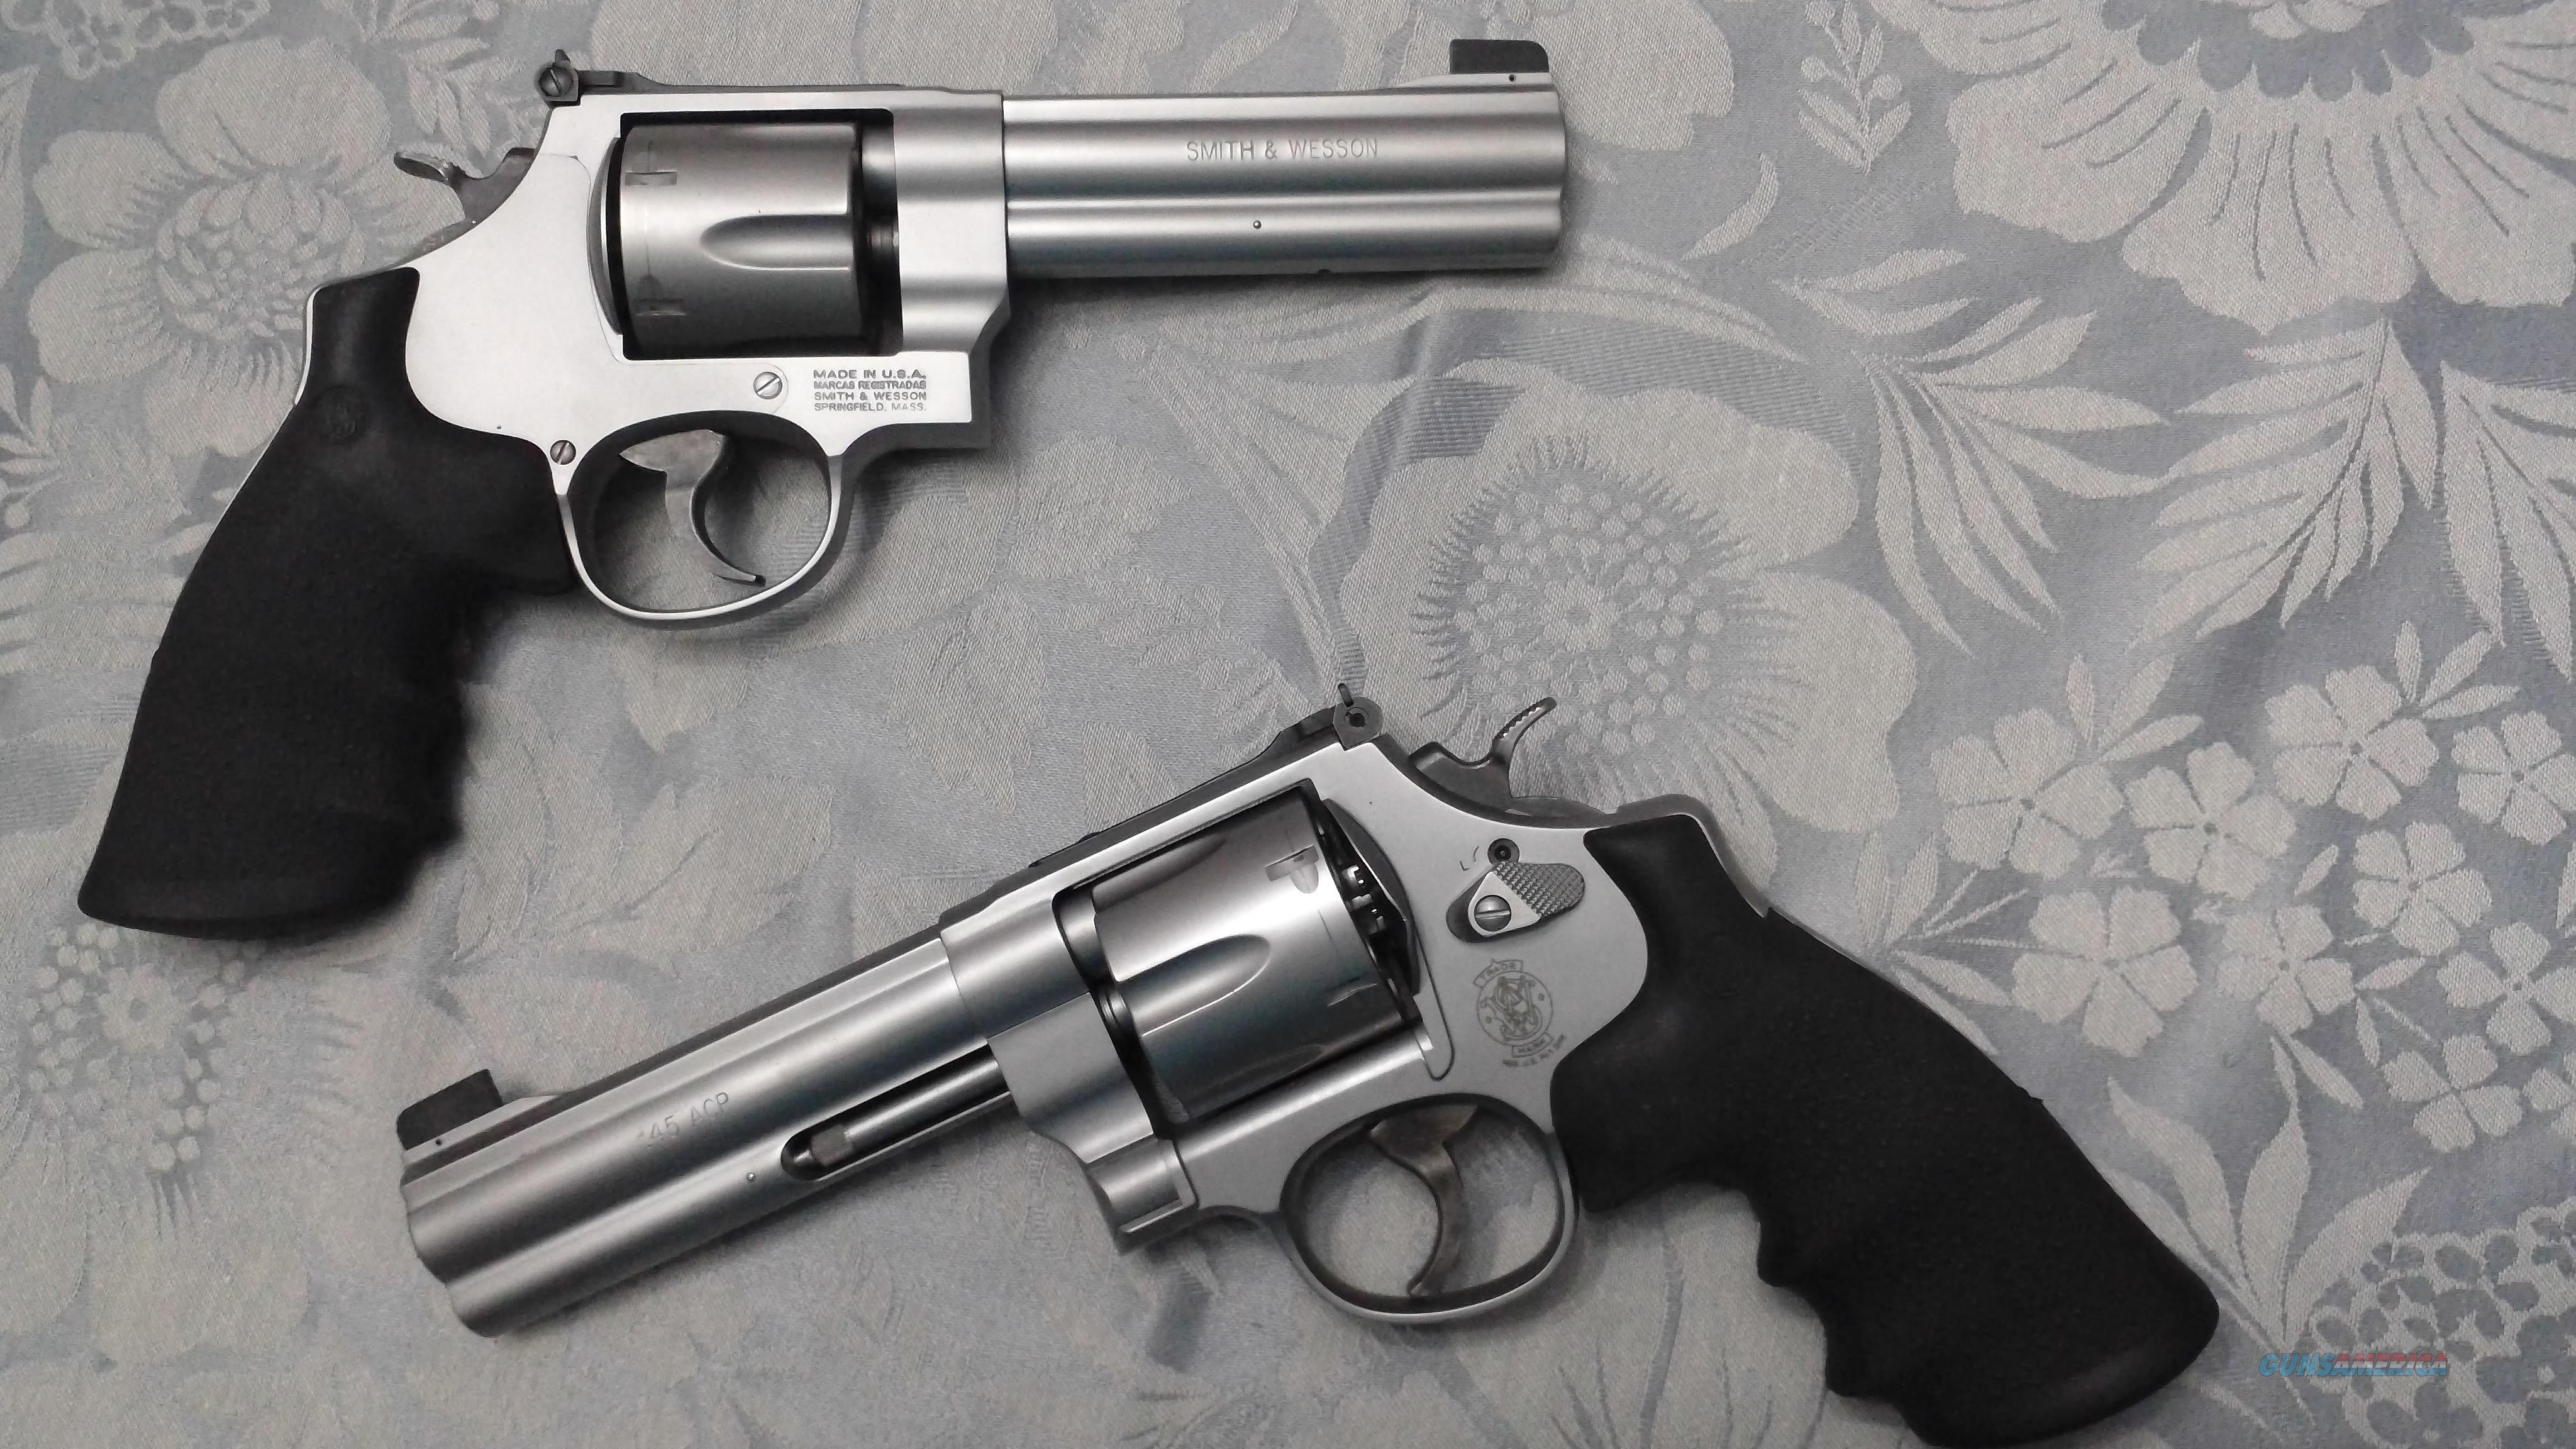 Smith & Wesson 625-8  Guns > Pistols > Smith & Wesson Revolvers > Full Frame Revolver